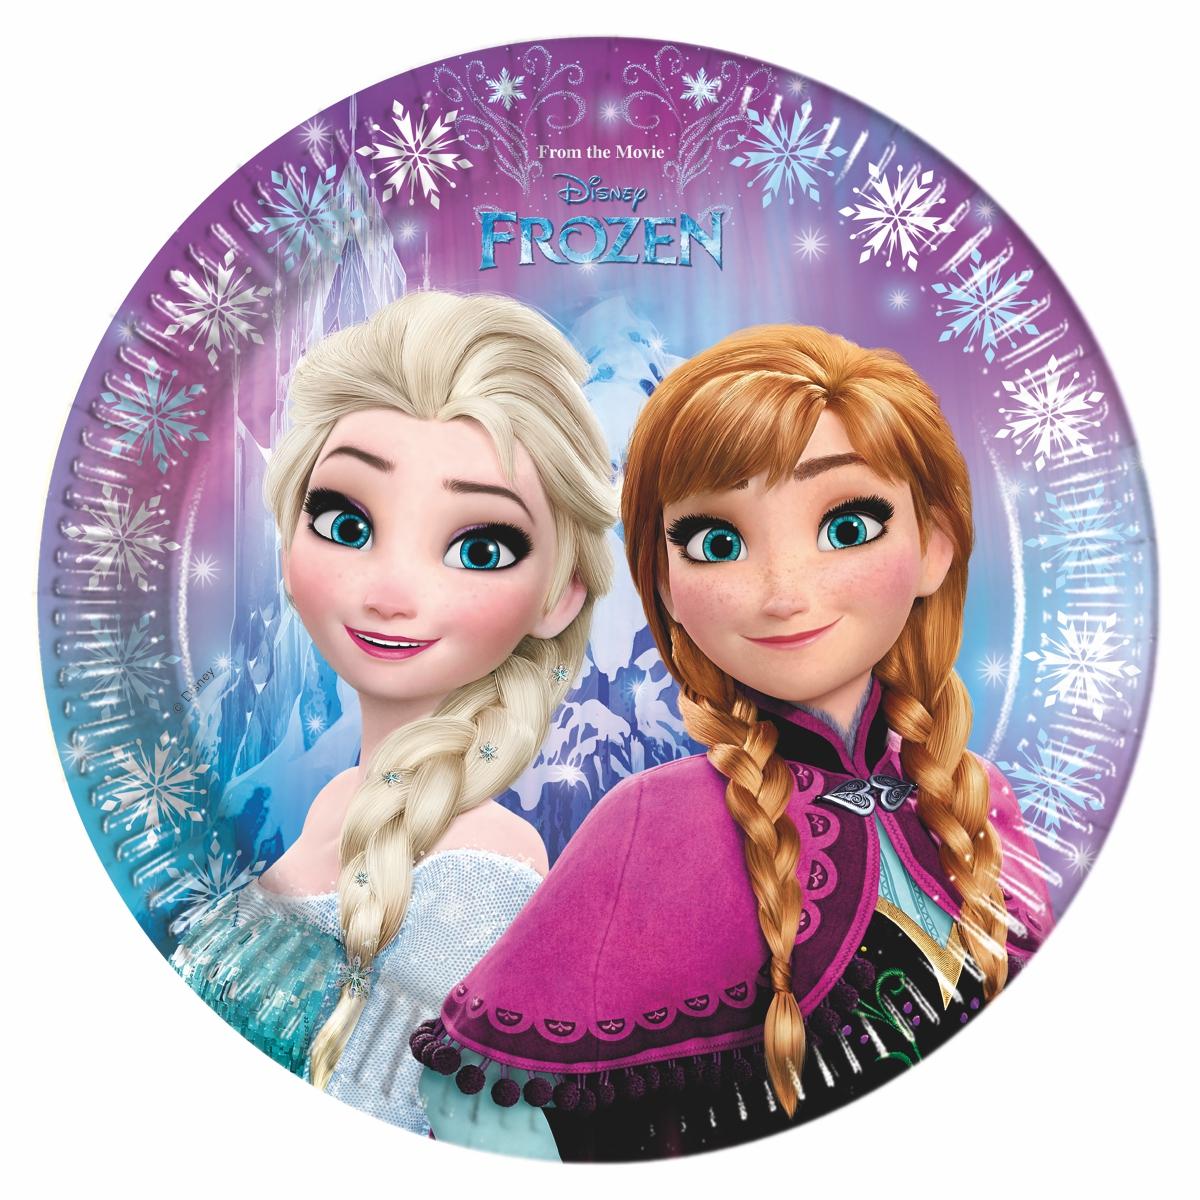 Frozen talíře 8ks 23cm Procos